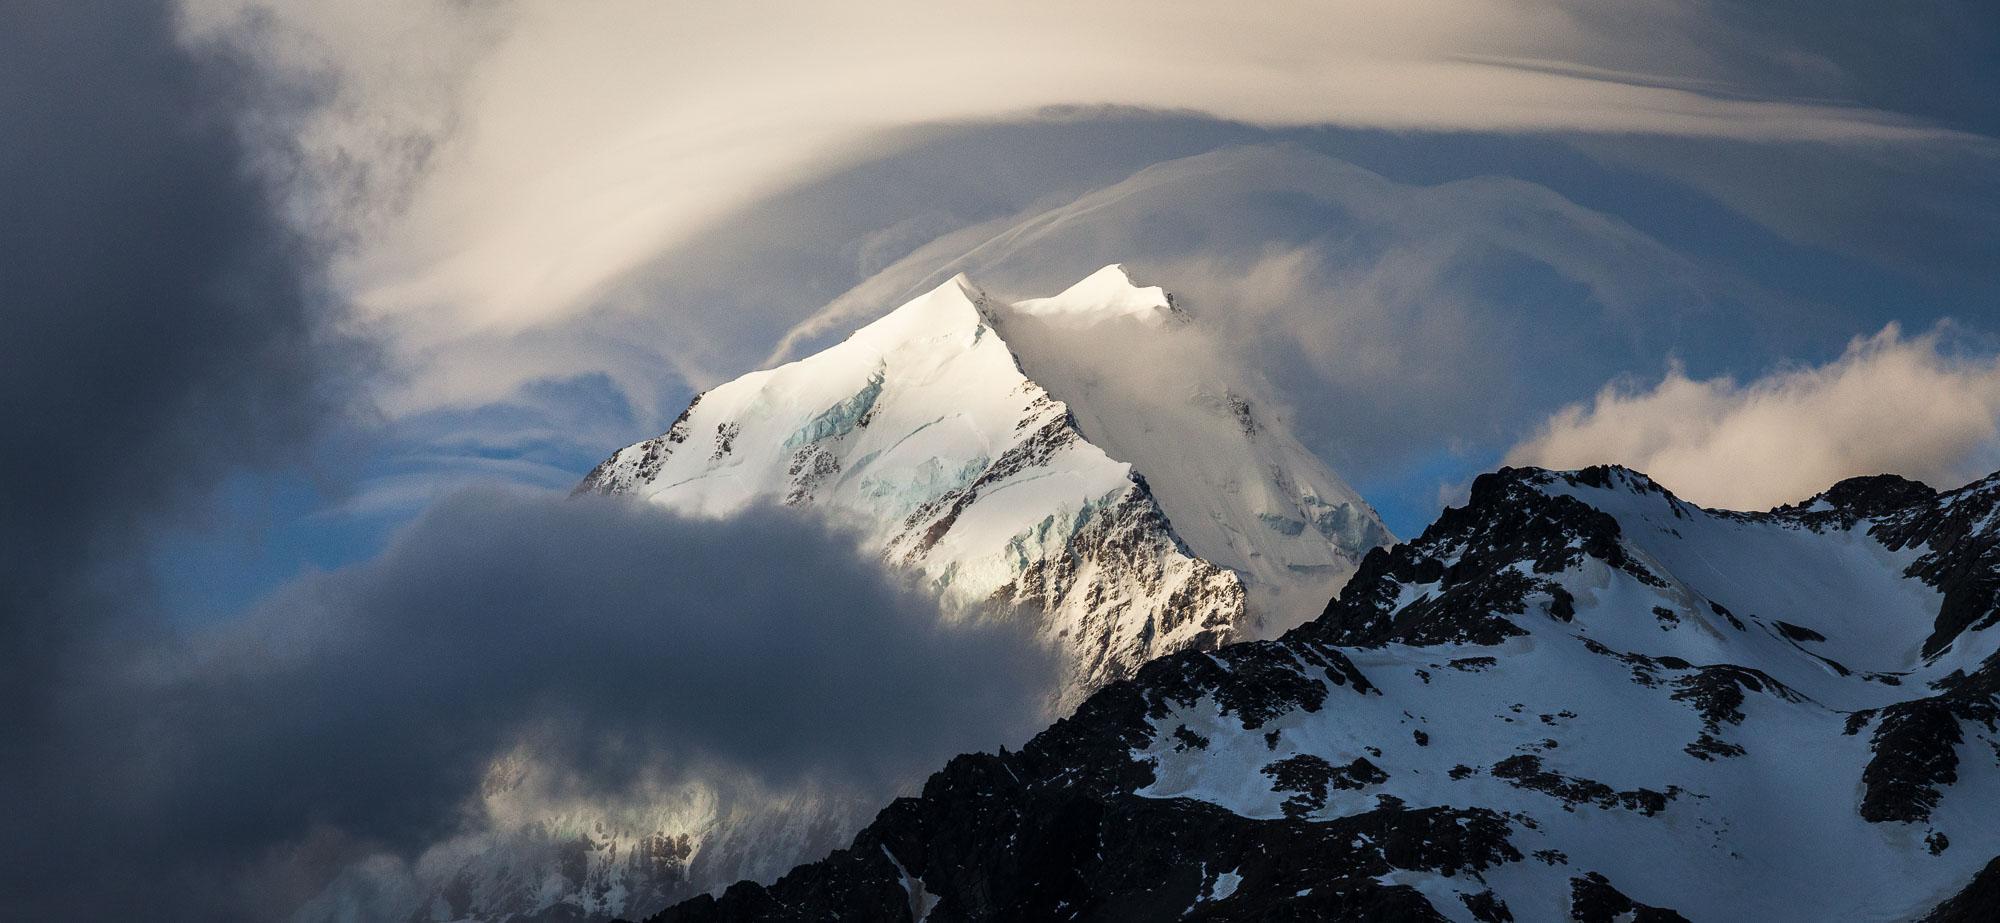 Photographing Aoraki Mount Cook